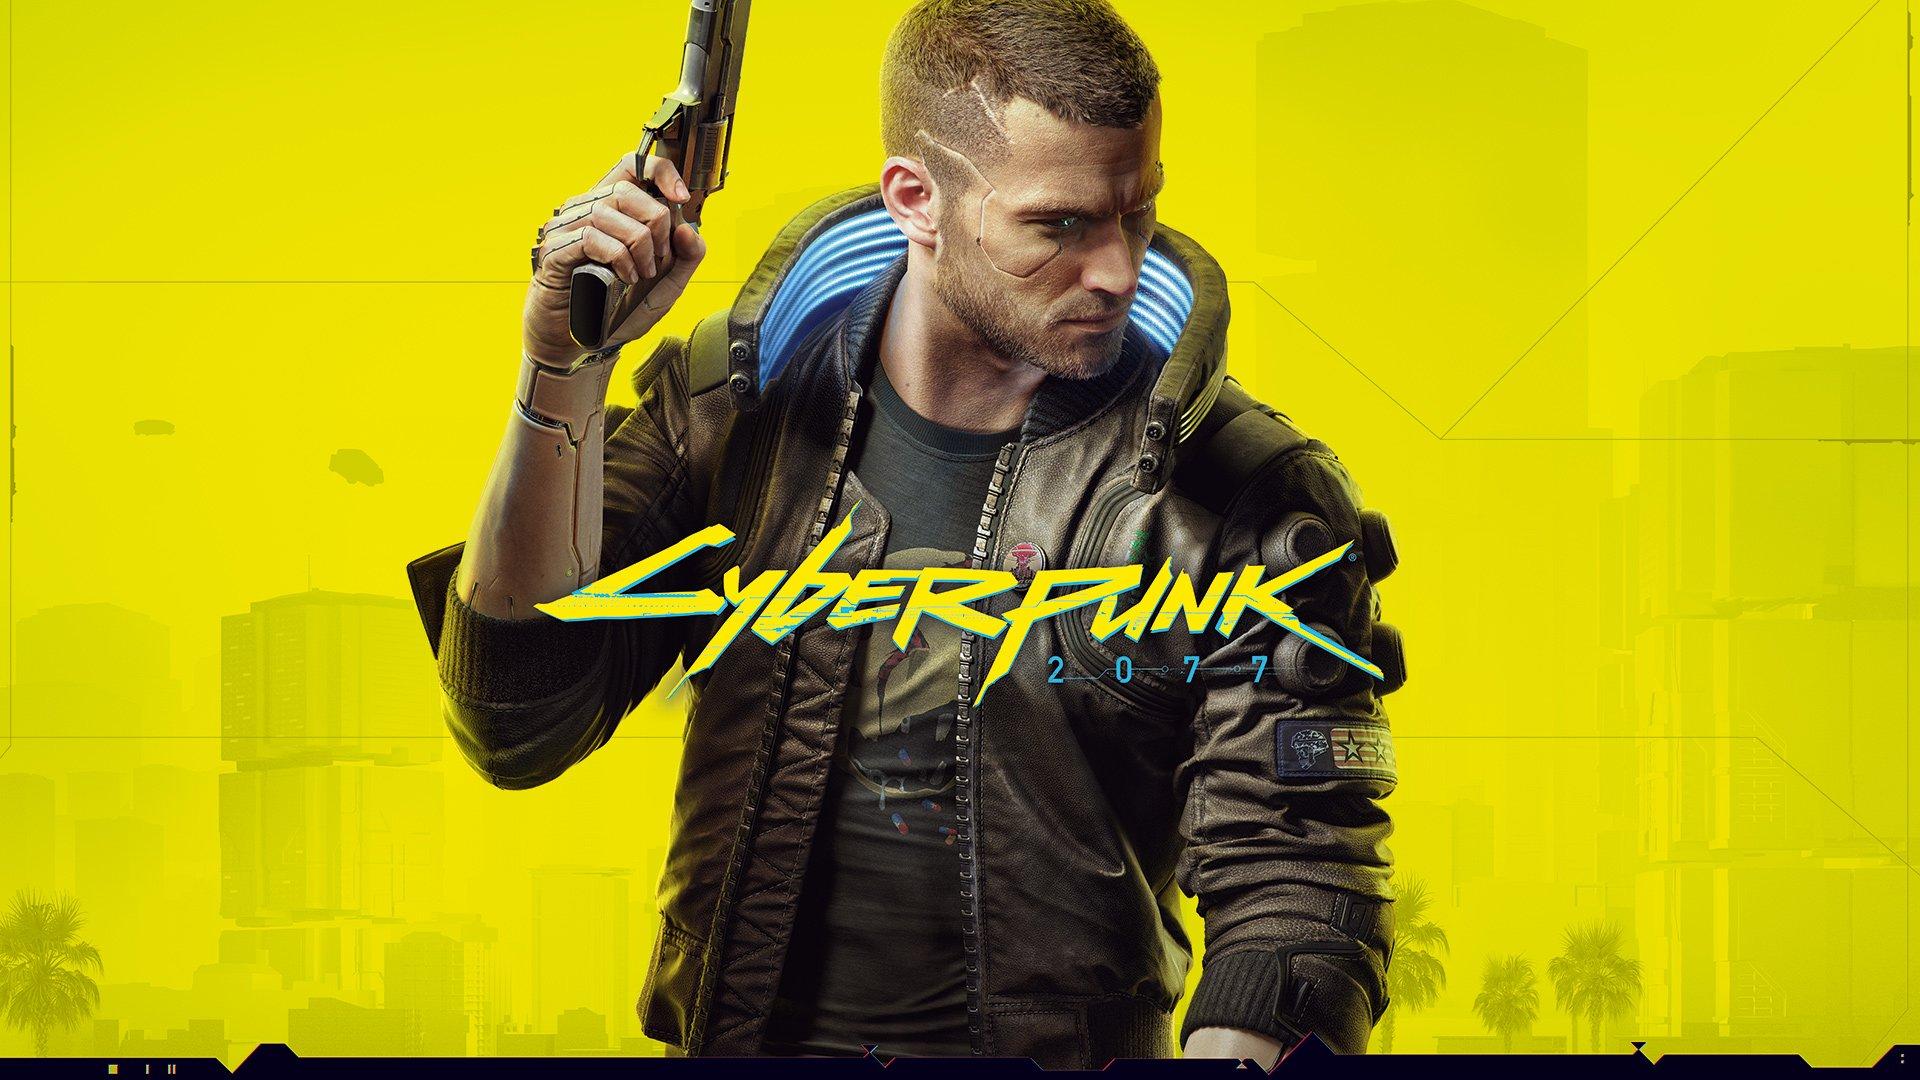 cyberpunk-2077-removed-playstation-store.jpg